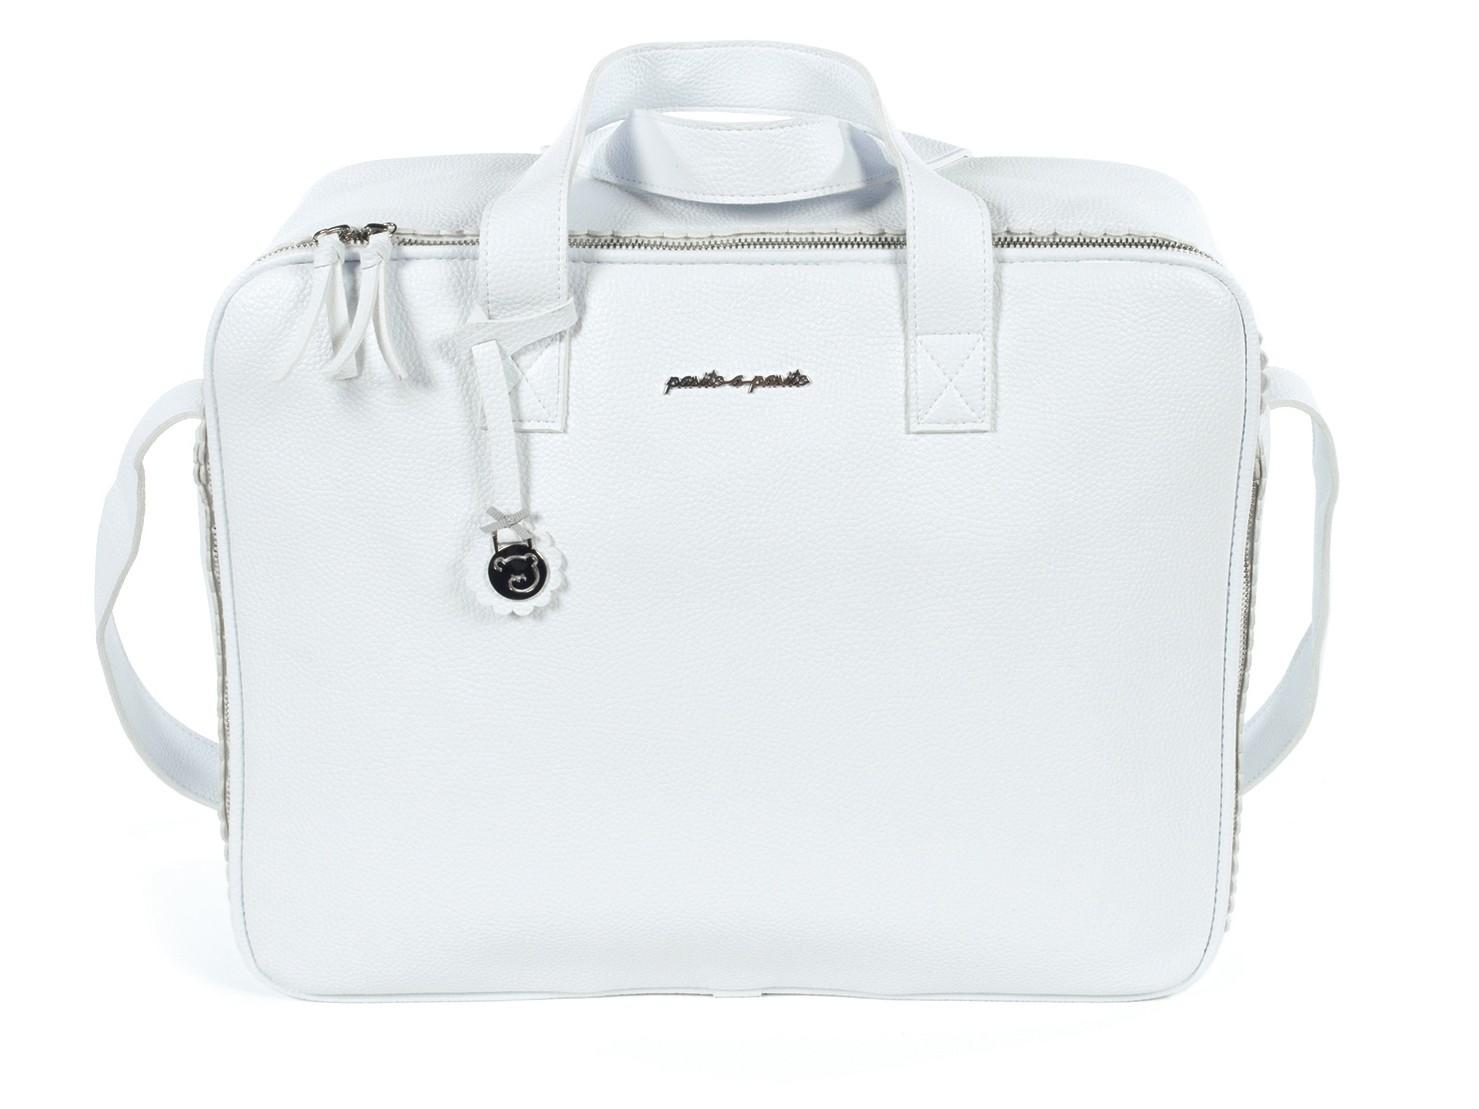 Pasito a Pasito Koffer Total White